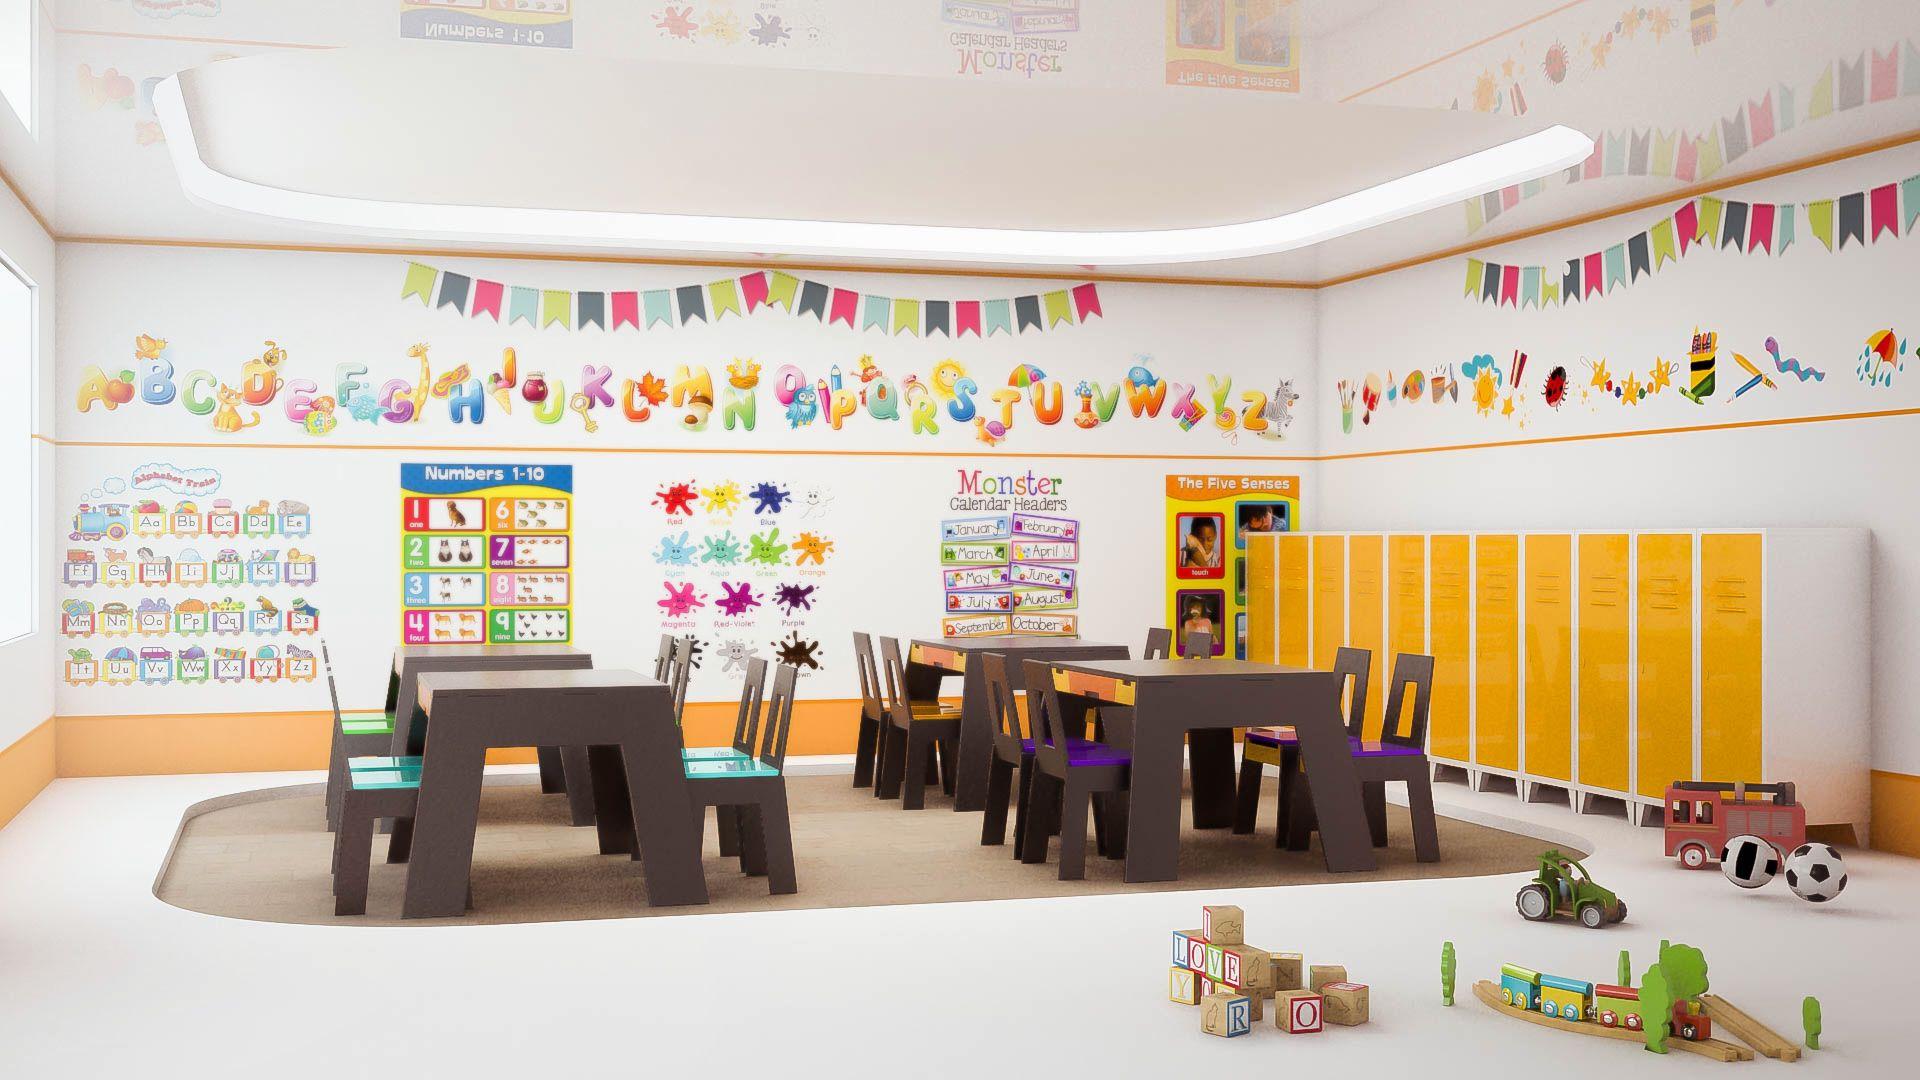 Kindergarten Interior Design - Escola - Pinterest - Pre School, Interiors